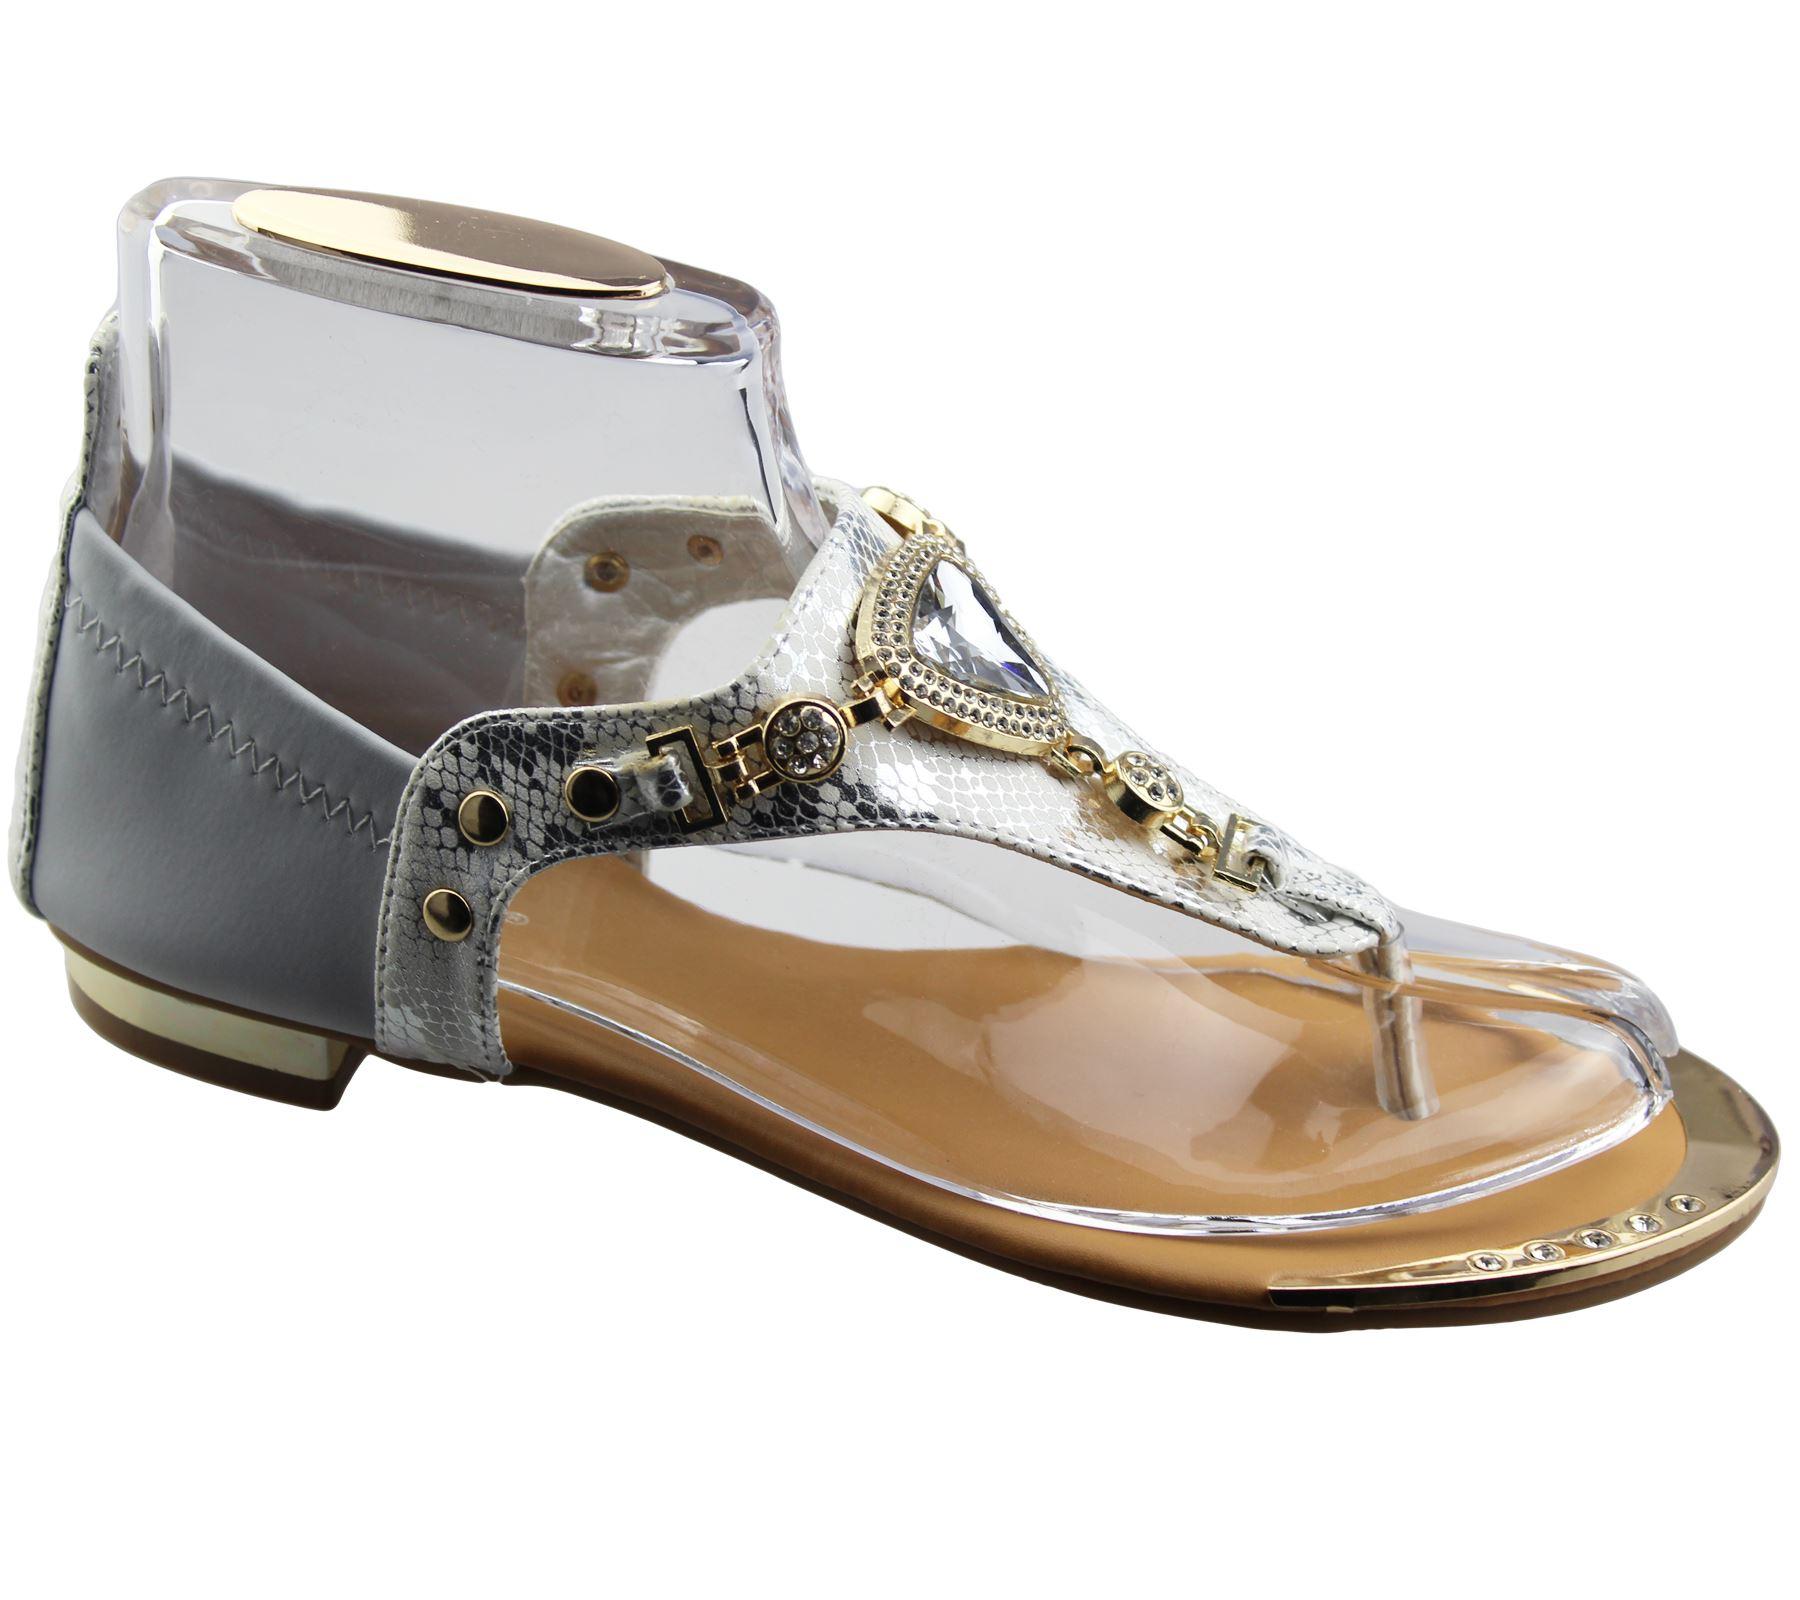 Womens-Flat-Summer-Sandals-Ladies-Diamante-Wedding-Toe-Post-Casual-Slipper thumbnail 10